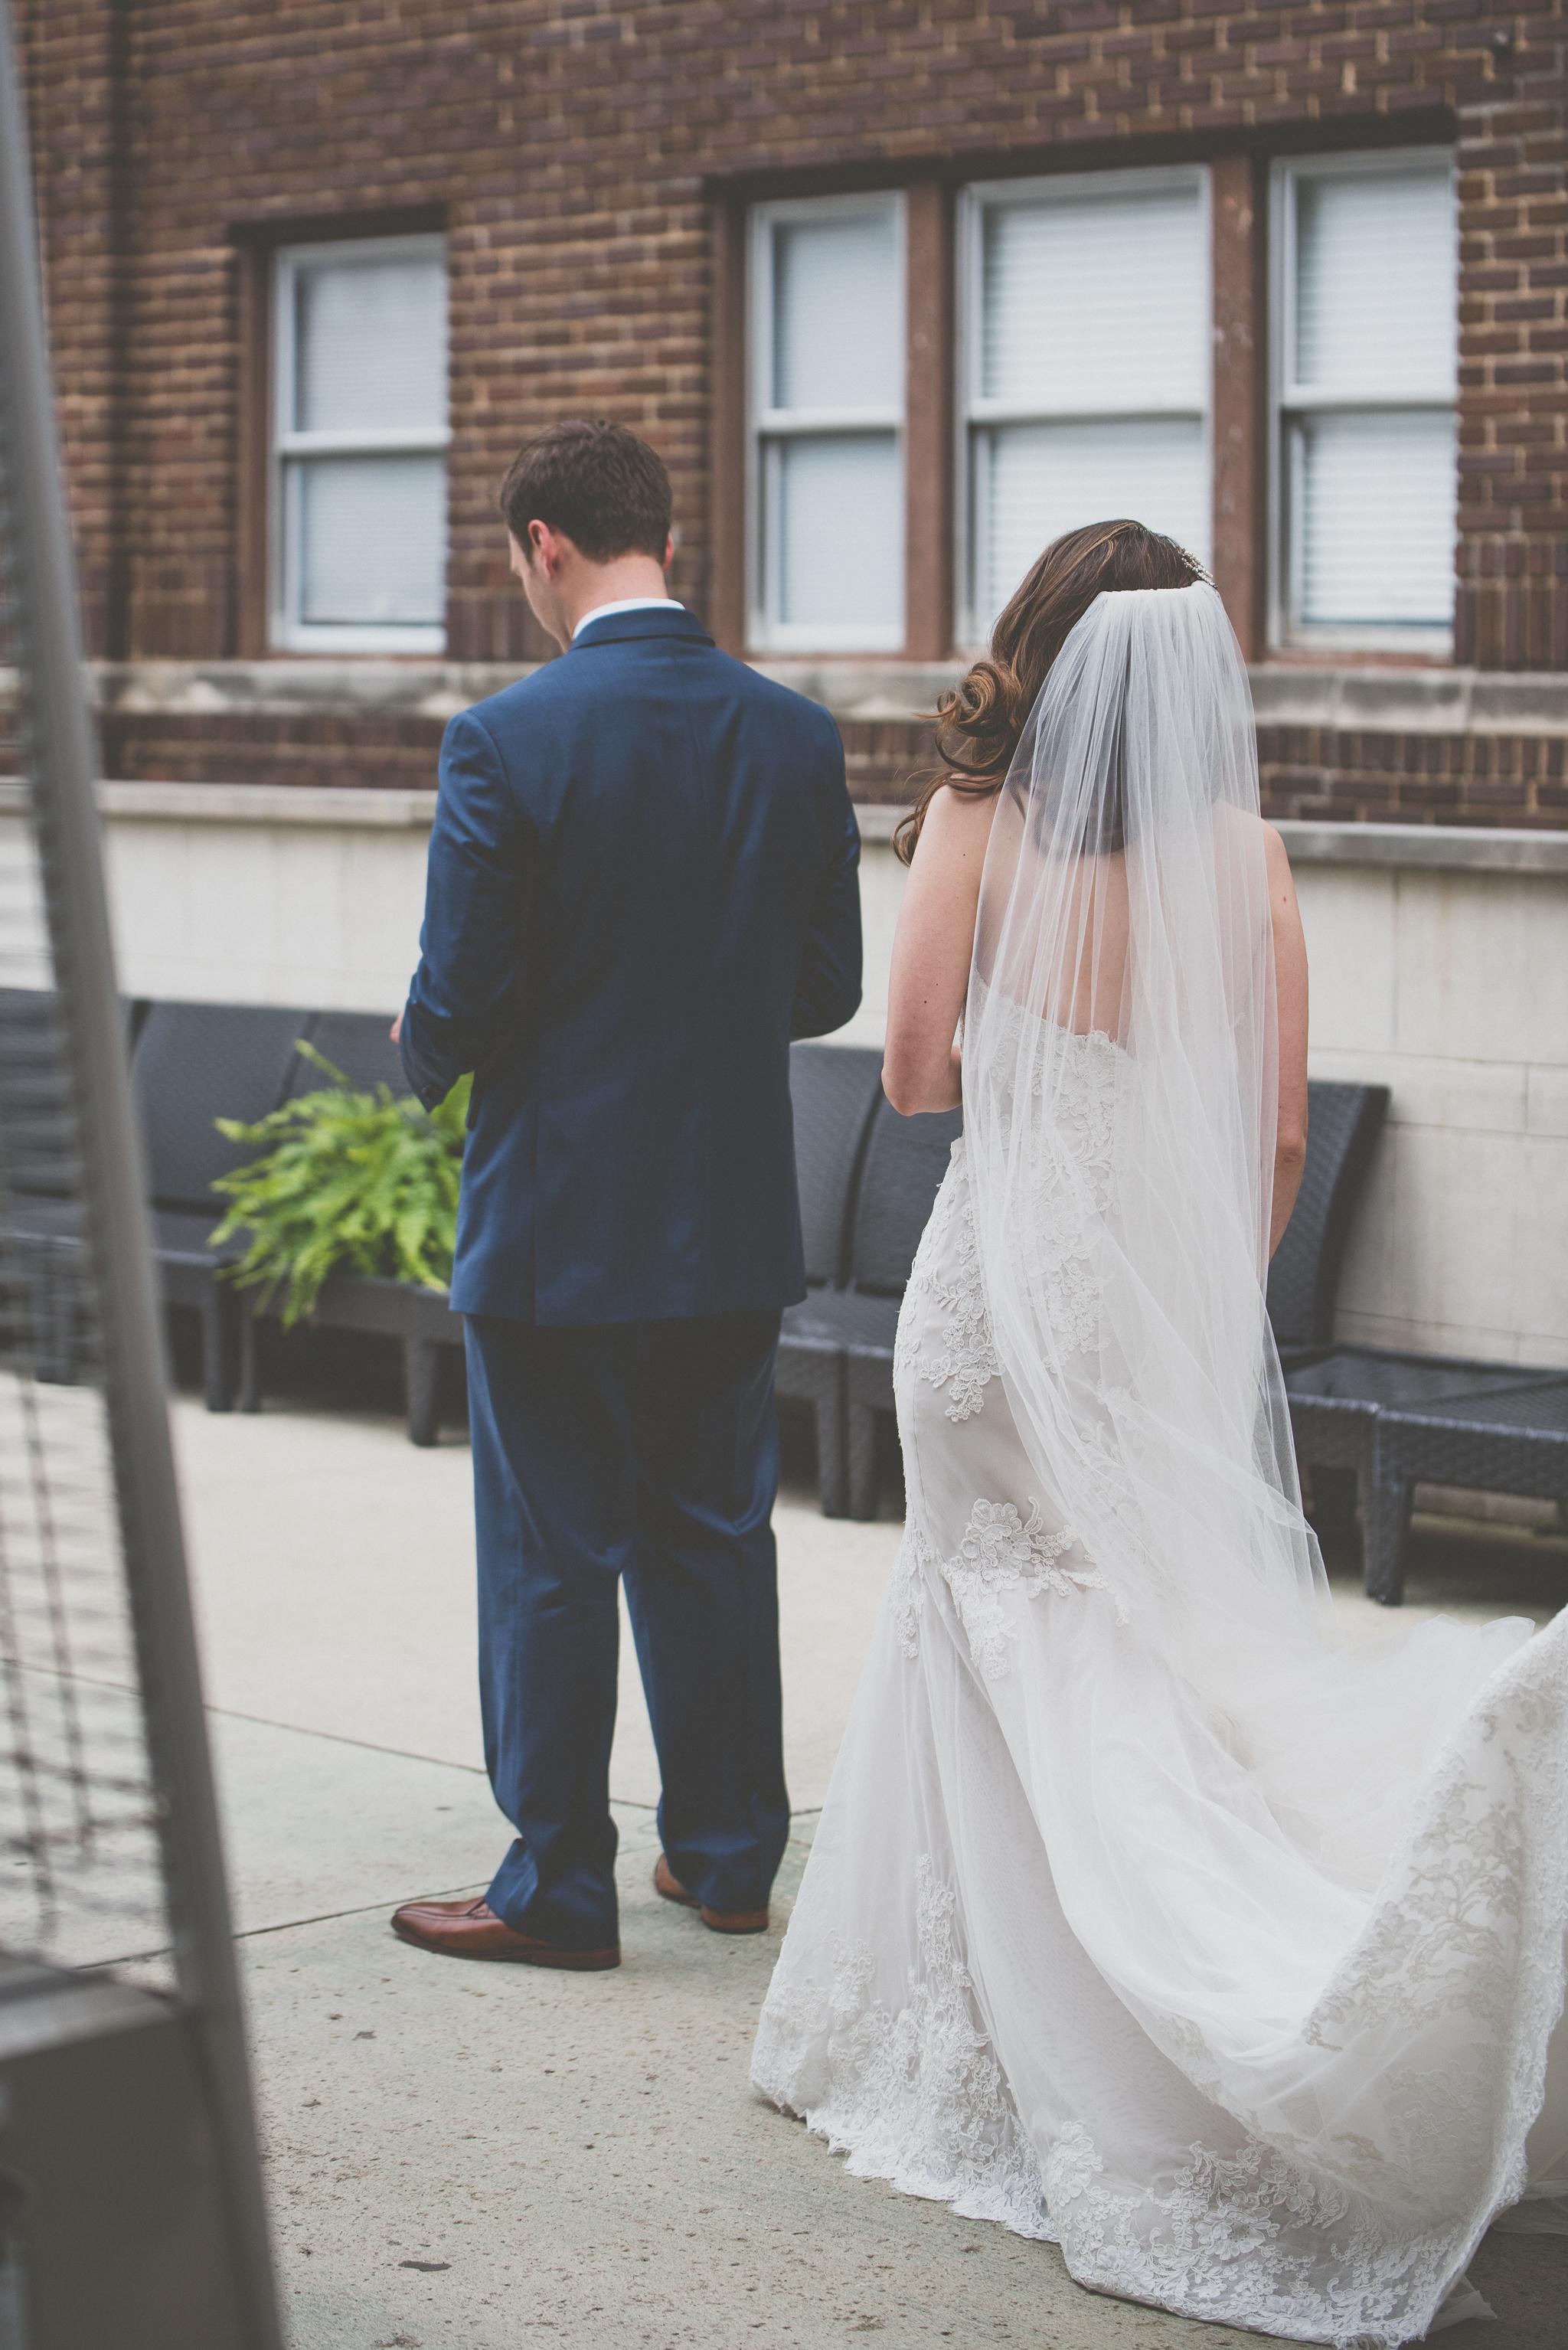 KELLY+DAN WEDDING PREVIEWS